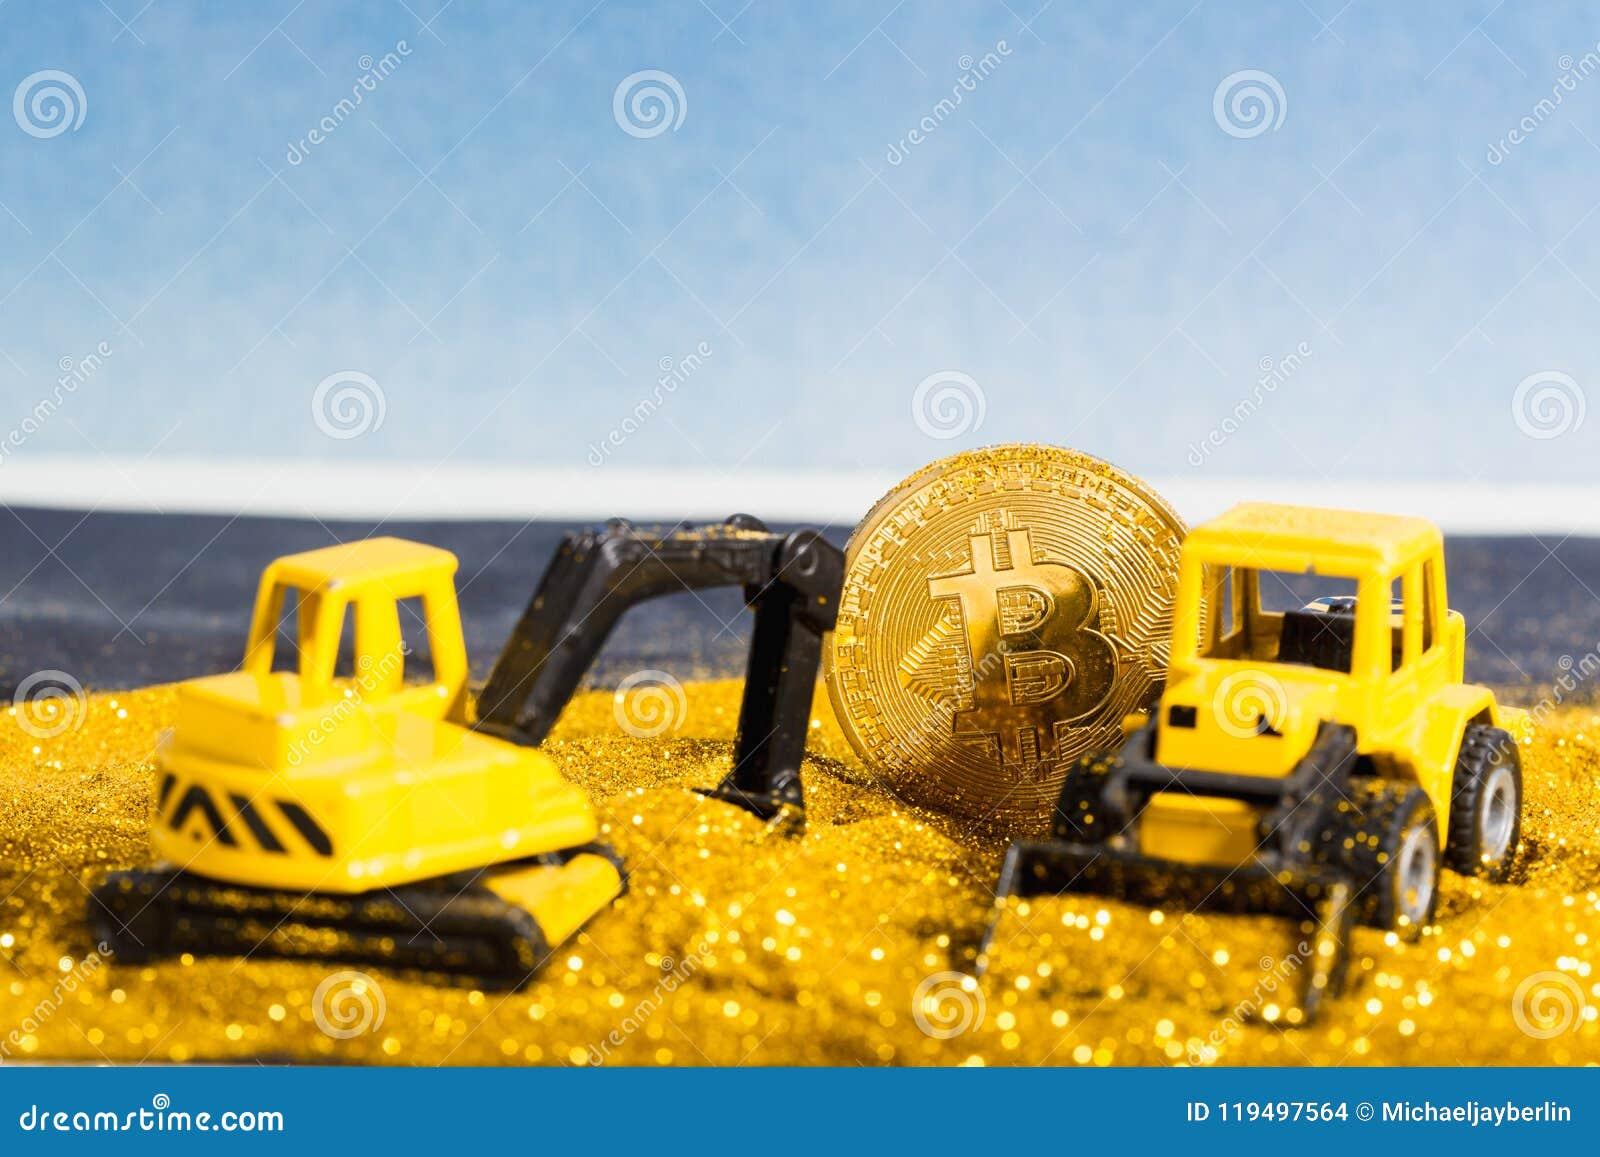 Eve dark glitter mining bitcoins 3betting from the blindspot